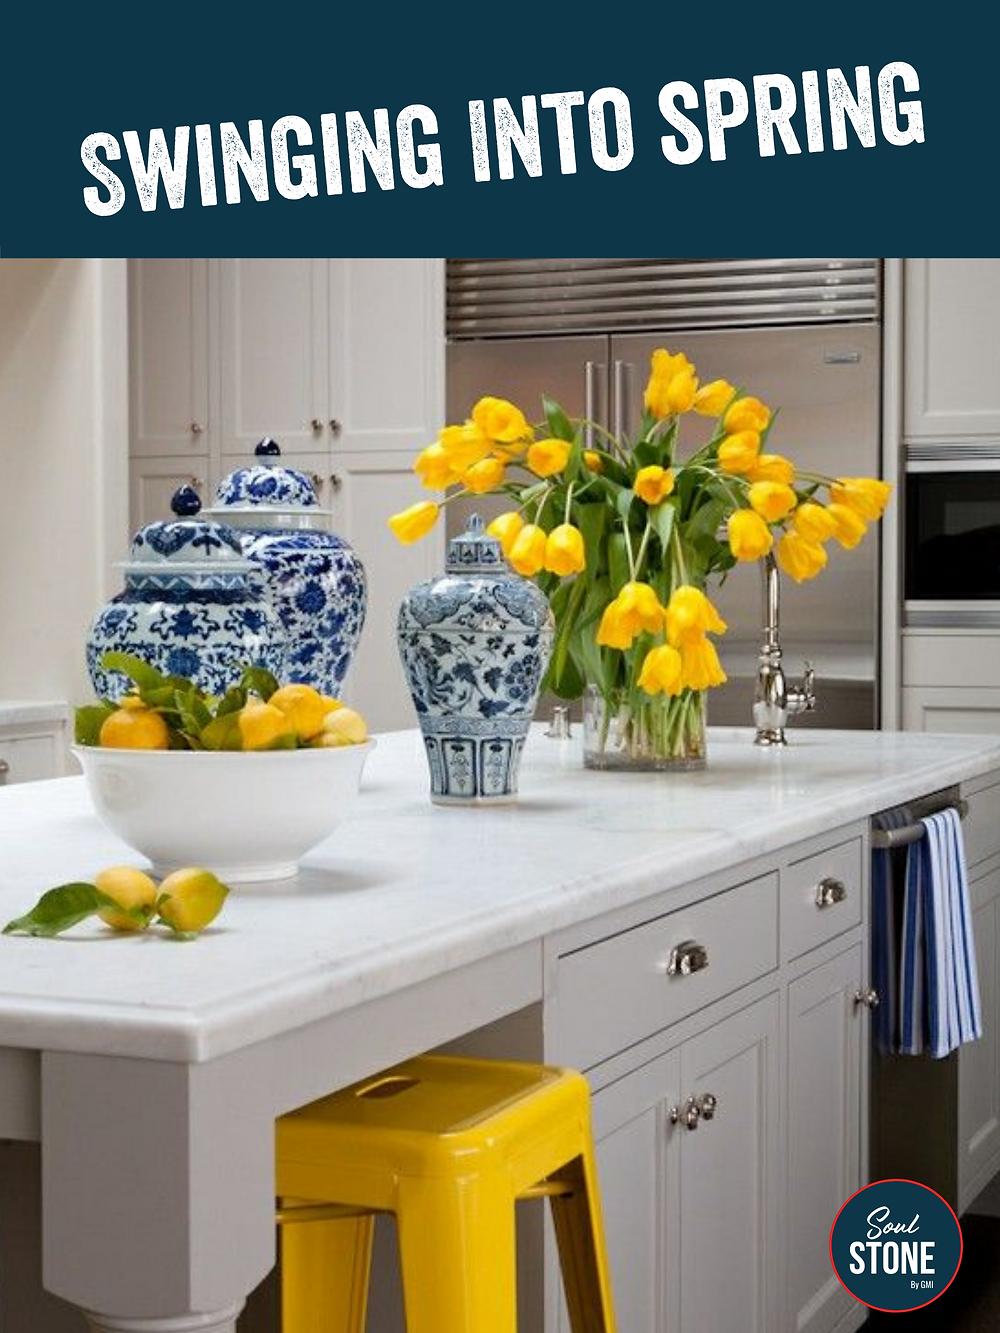 yellow tulips and yellow lemons on kitchen natural stone island